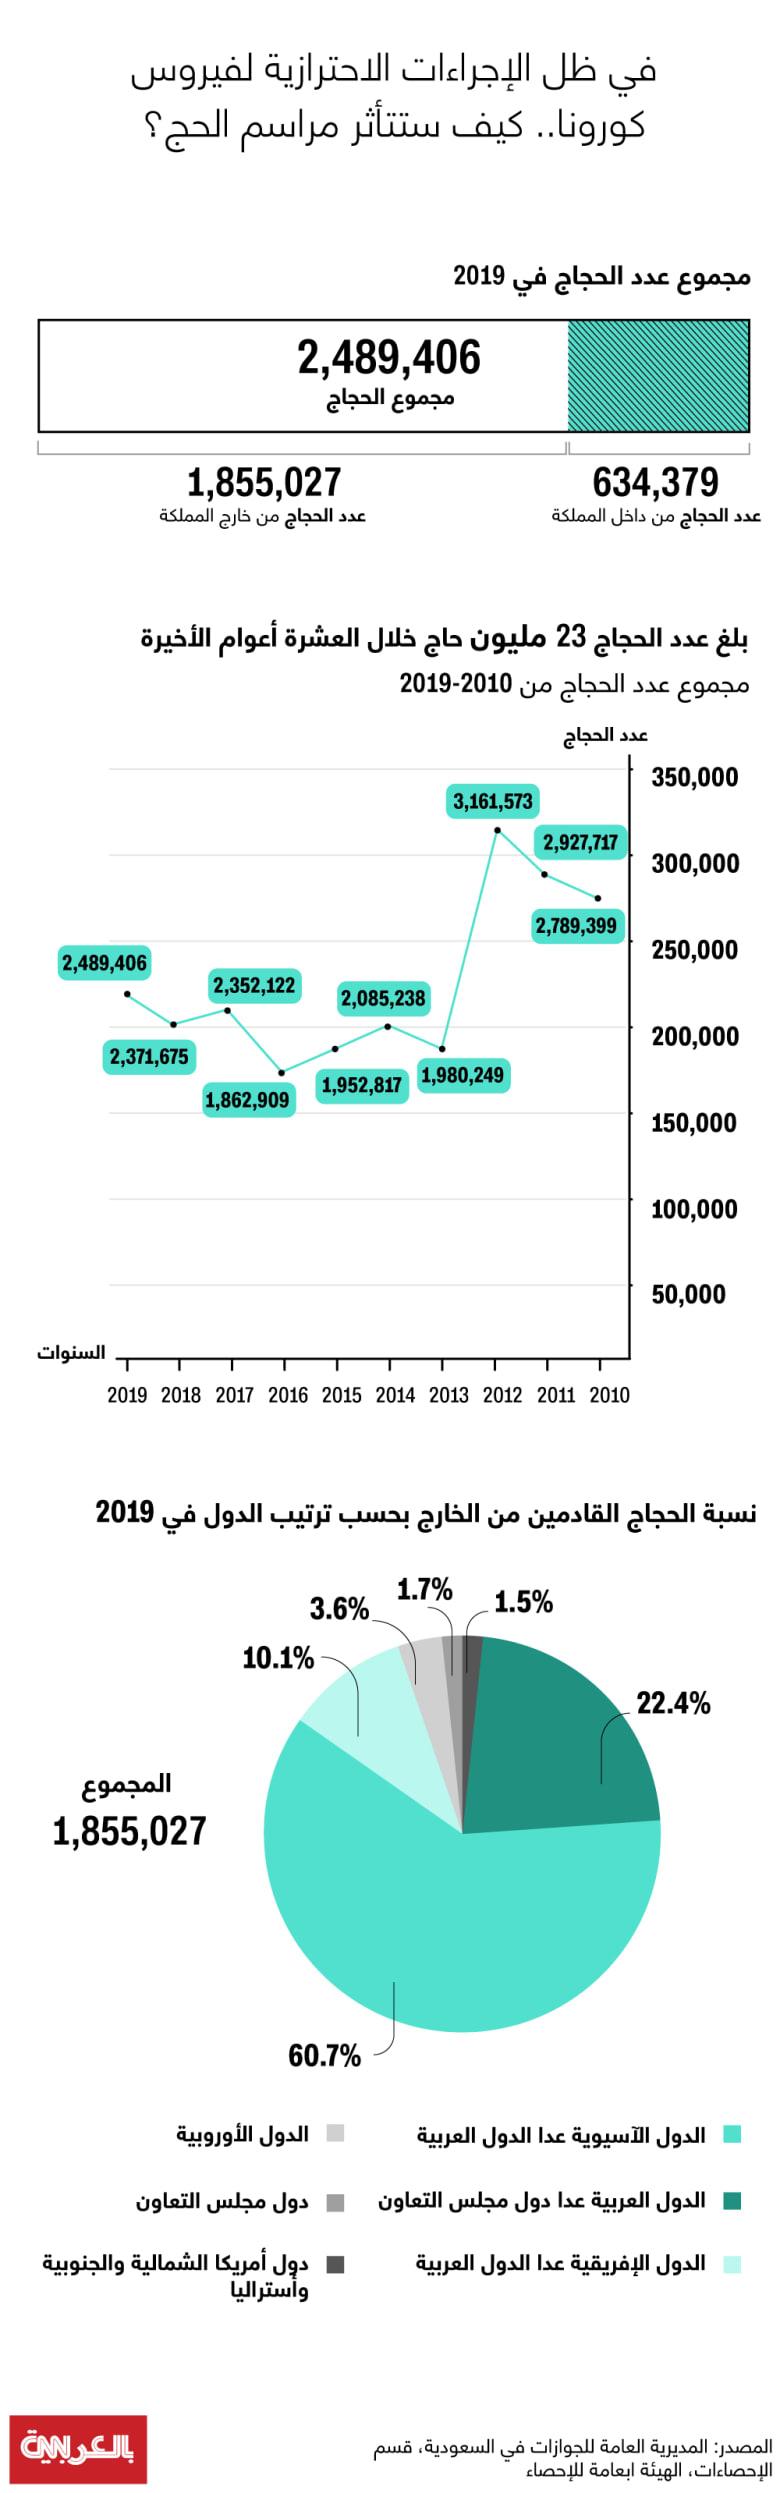 Hajj-corona-restrictions-affect